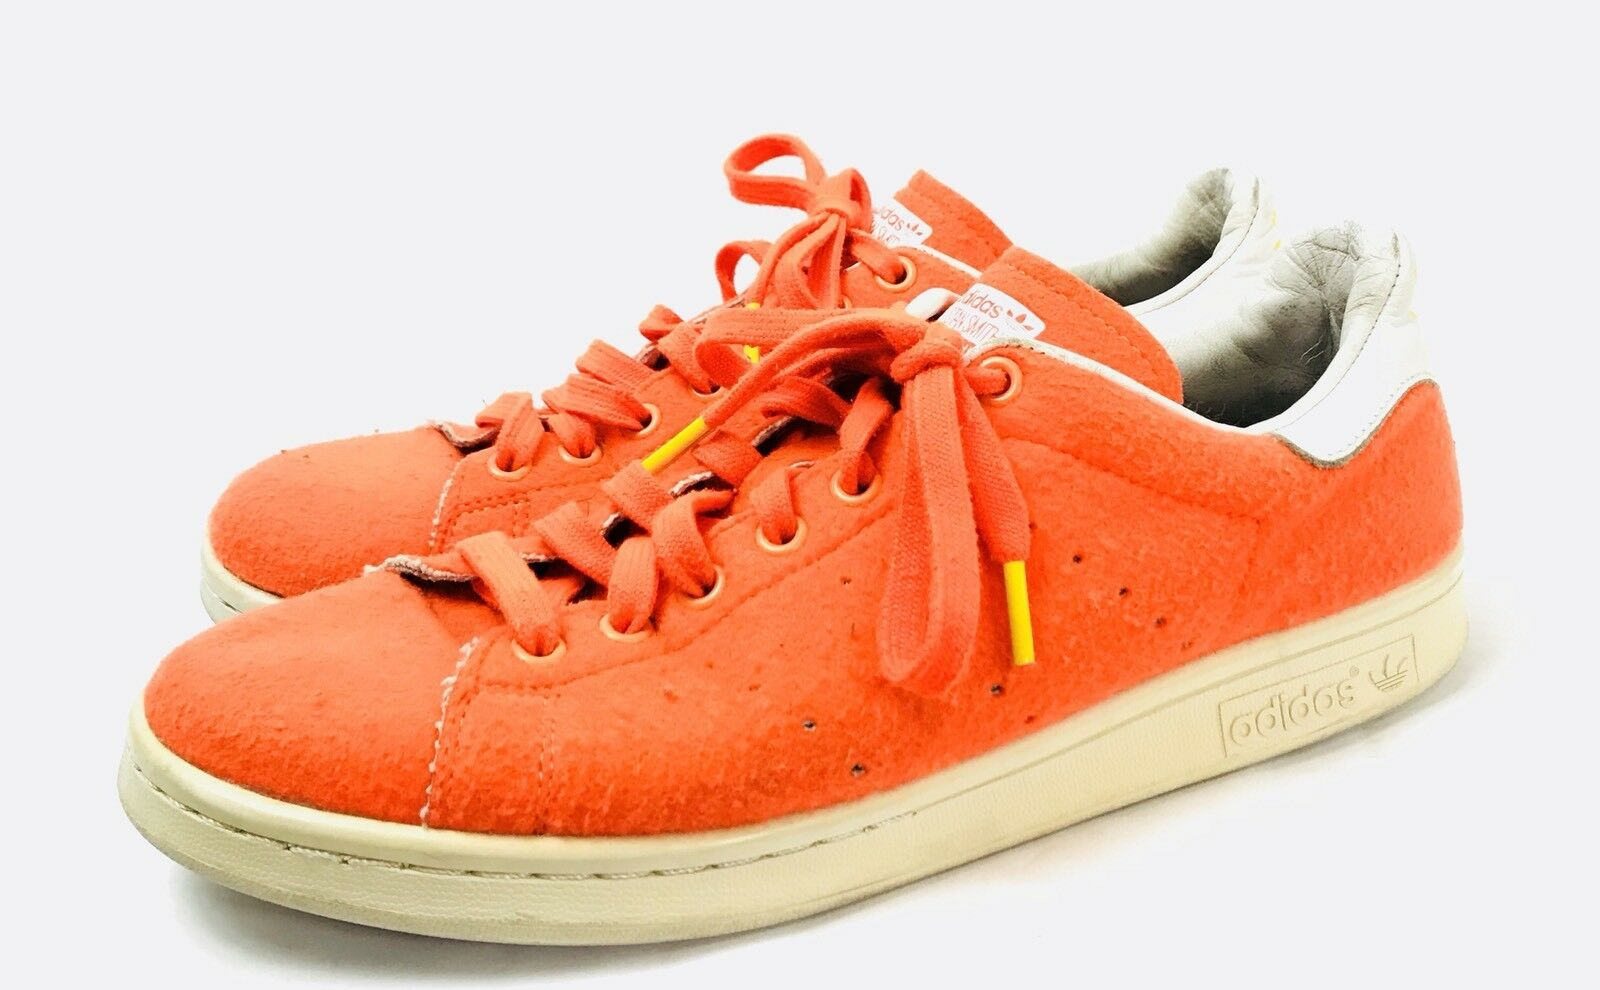 Adidas Stan Smith Pharrell Williams Tennis Ball Sneakers Orange PW B25388 Shoes Seasonal price cuts, discount benefits